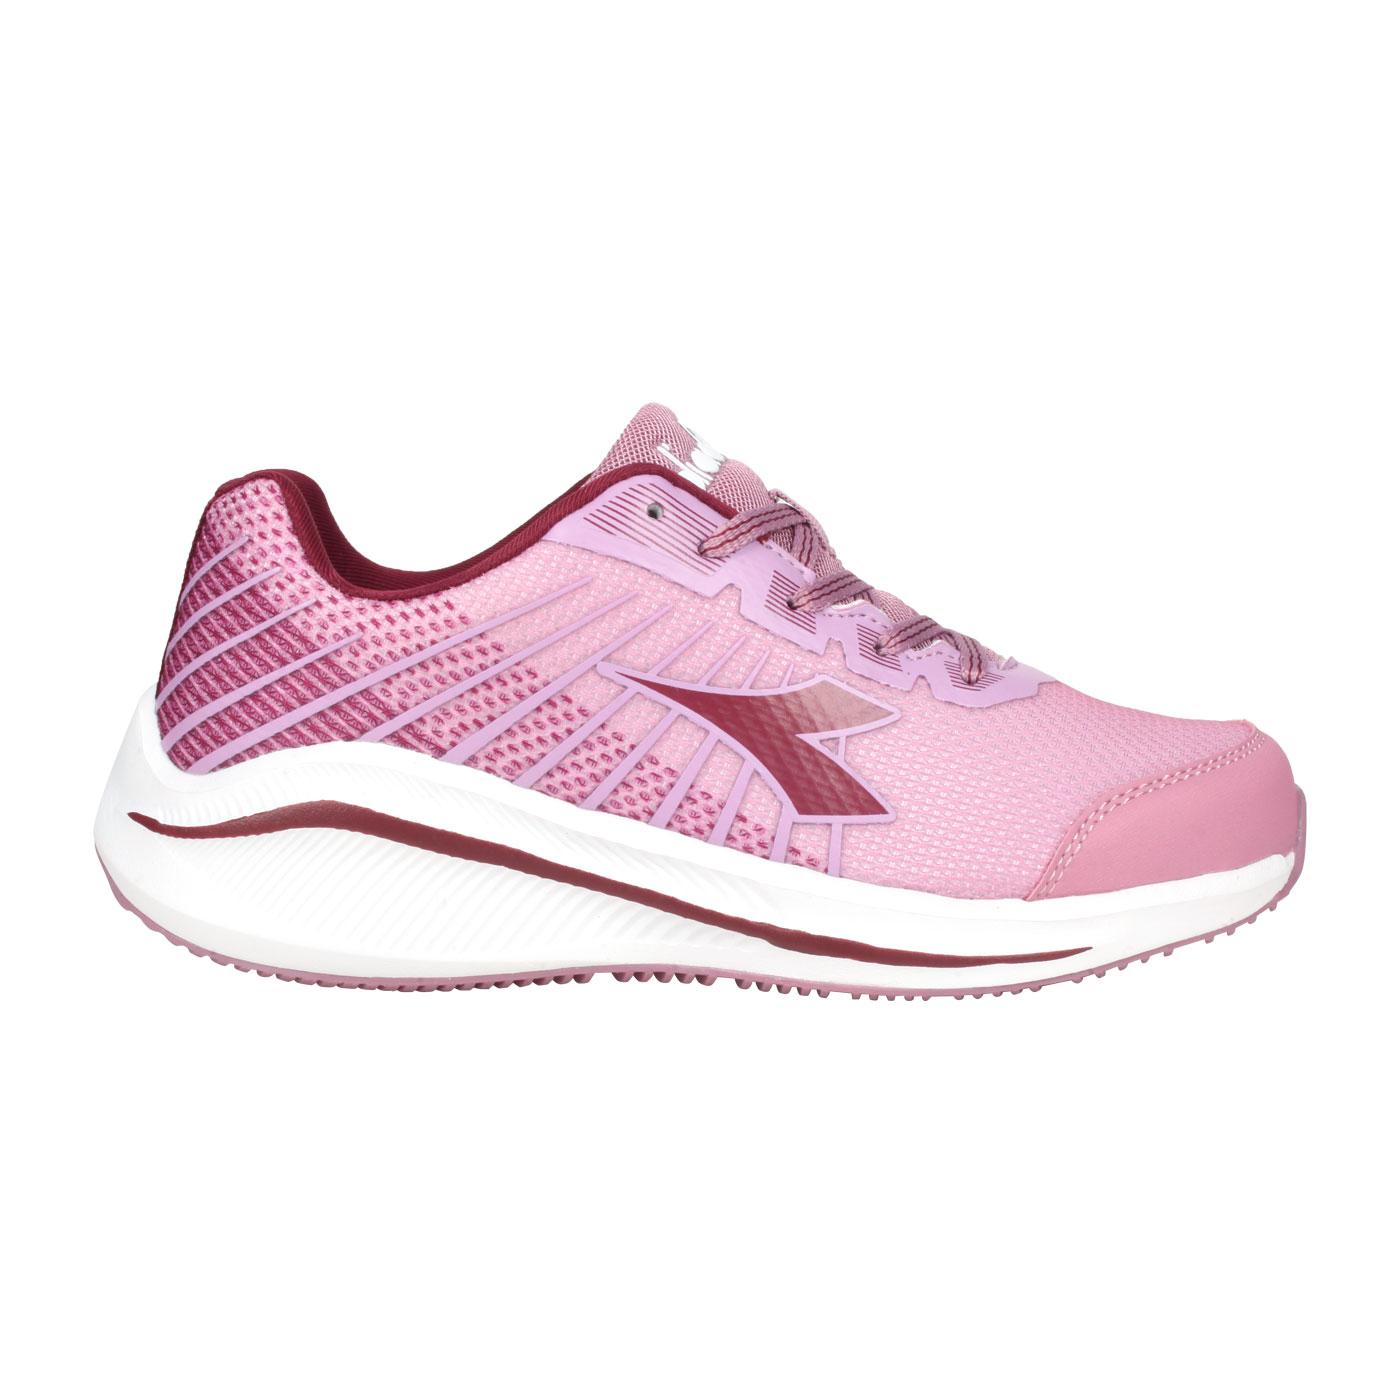 DIADORA 女款專業輕量慢跑鞋 DA31630 - 藕粉深紫